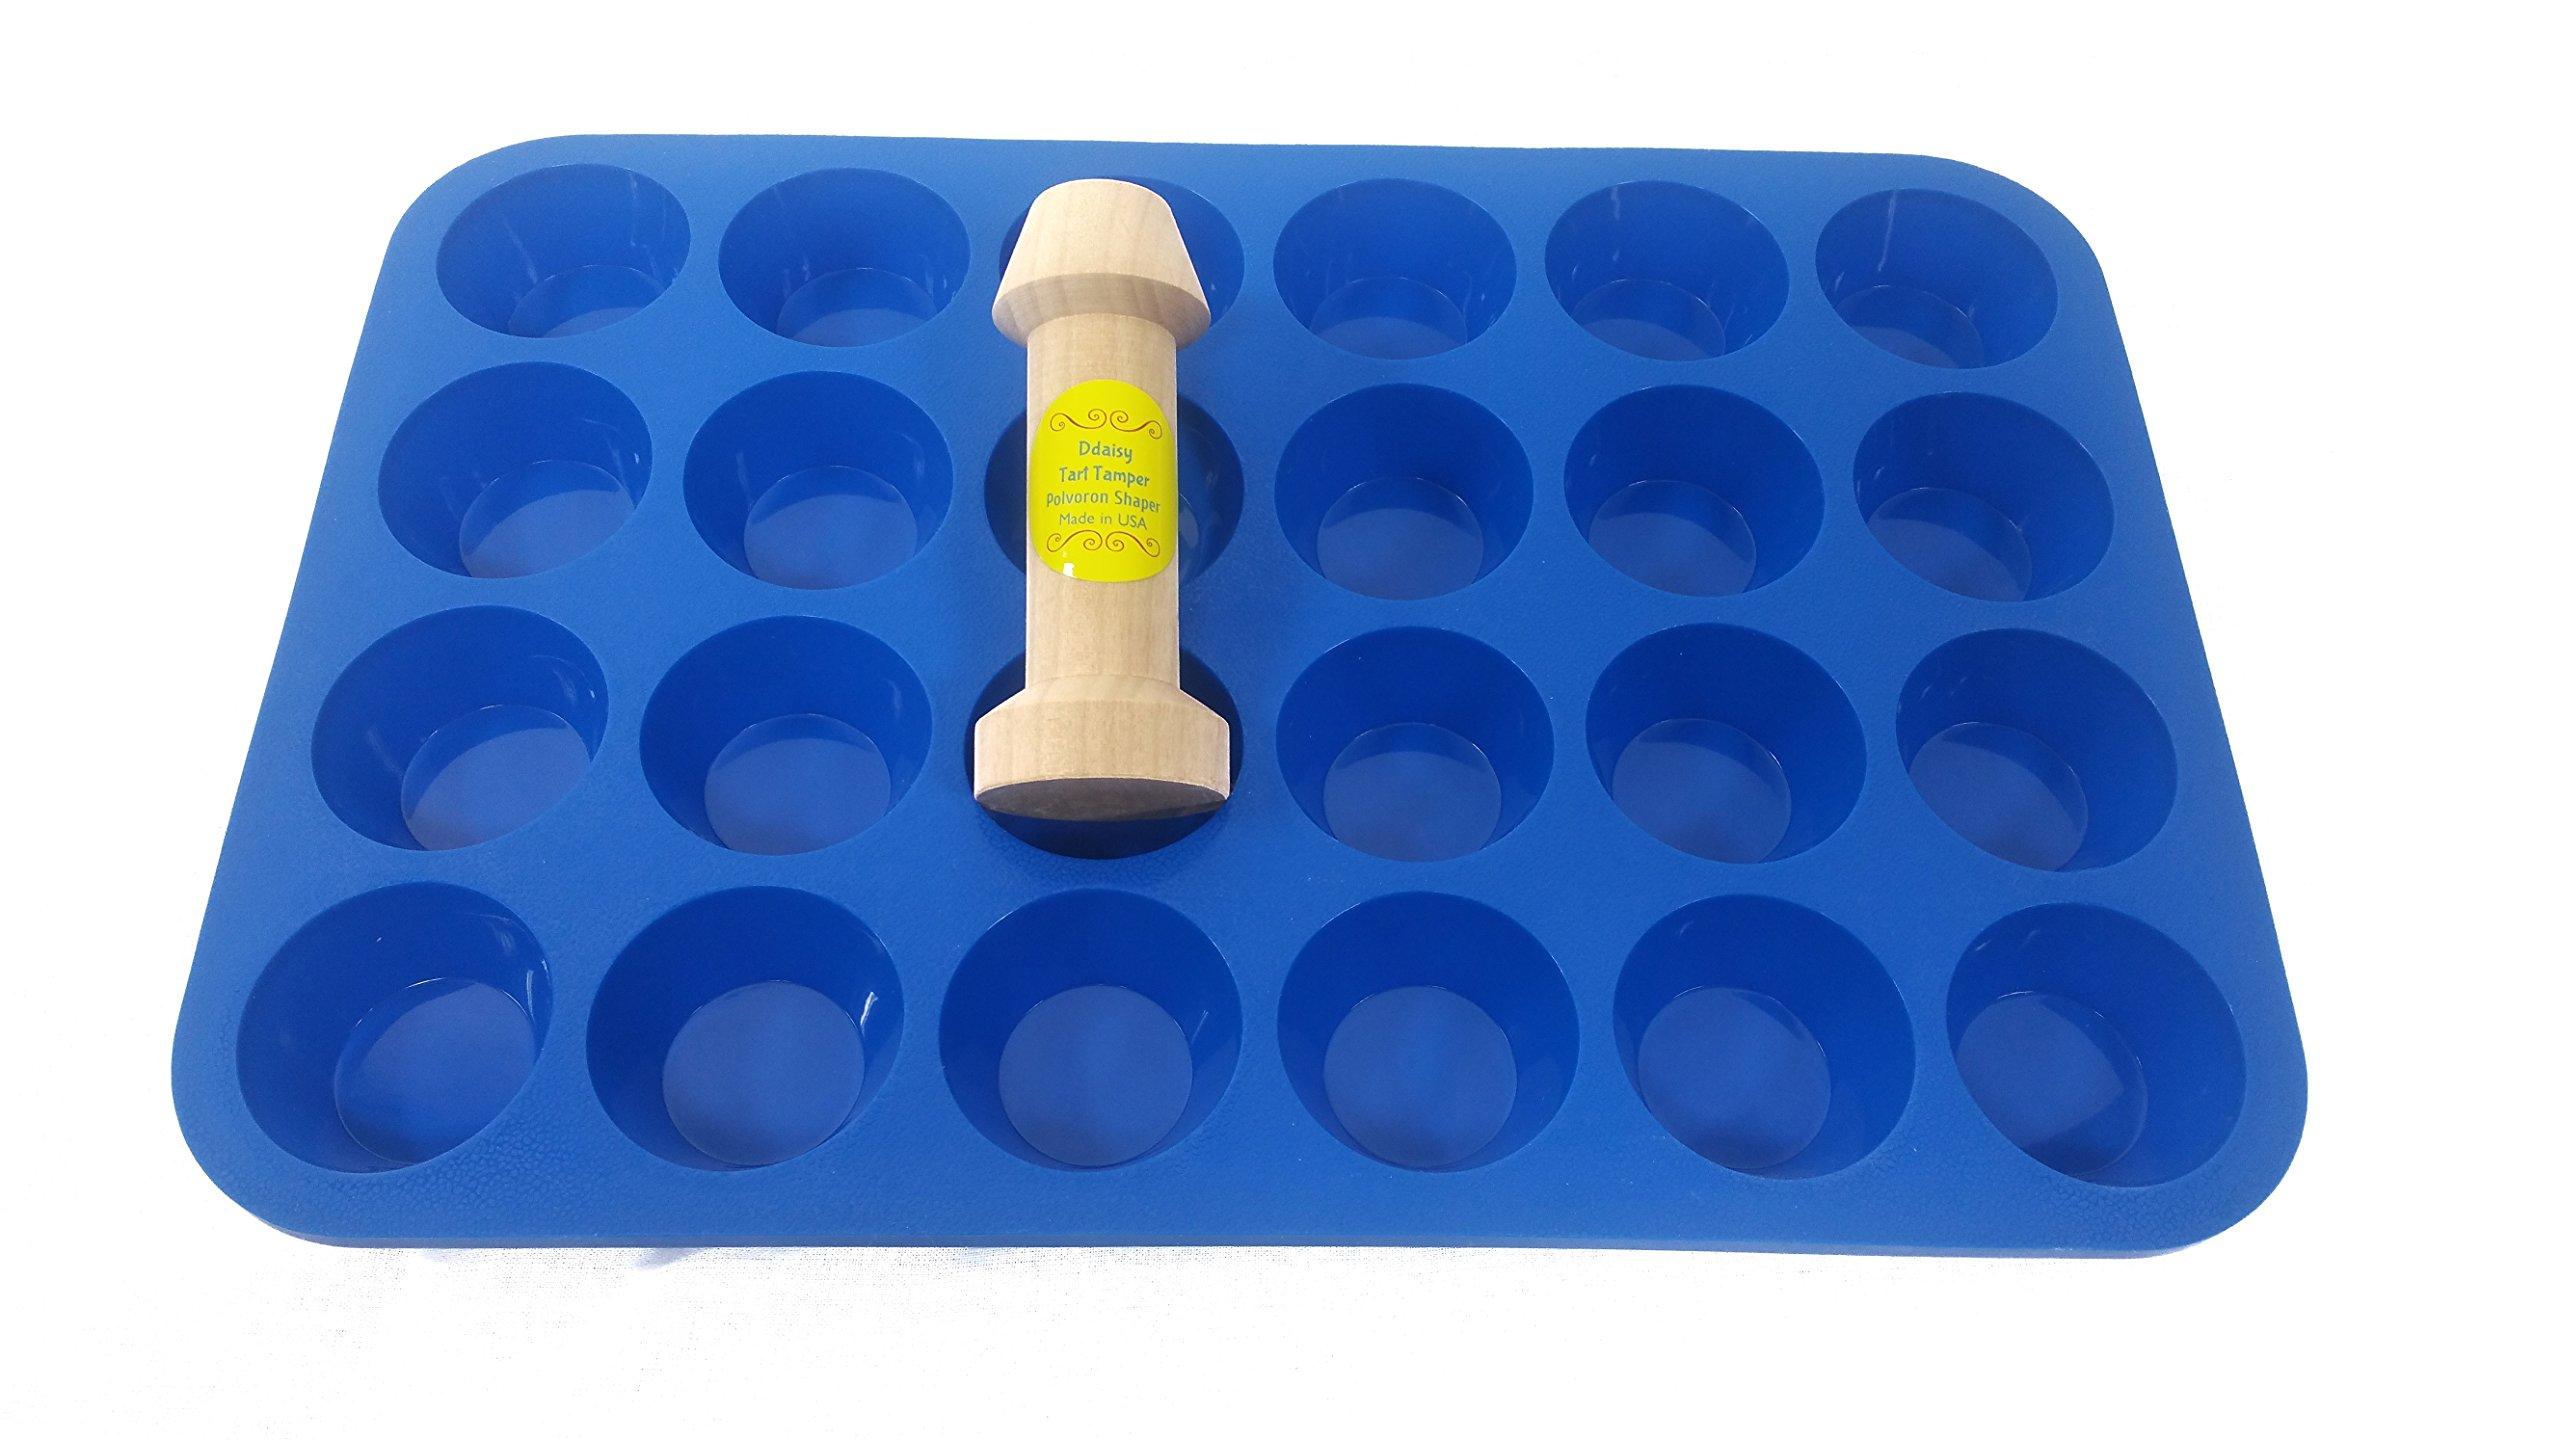 Ddaisy Tart Tamper & 24cup Silicone Mini Muffin Tart Pan Combo Blue